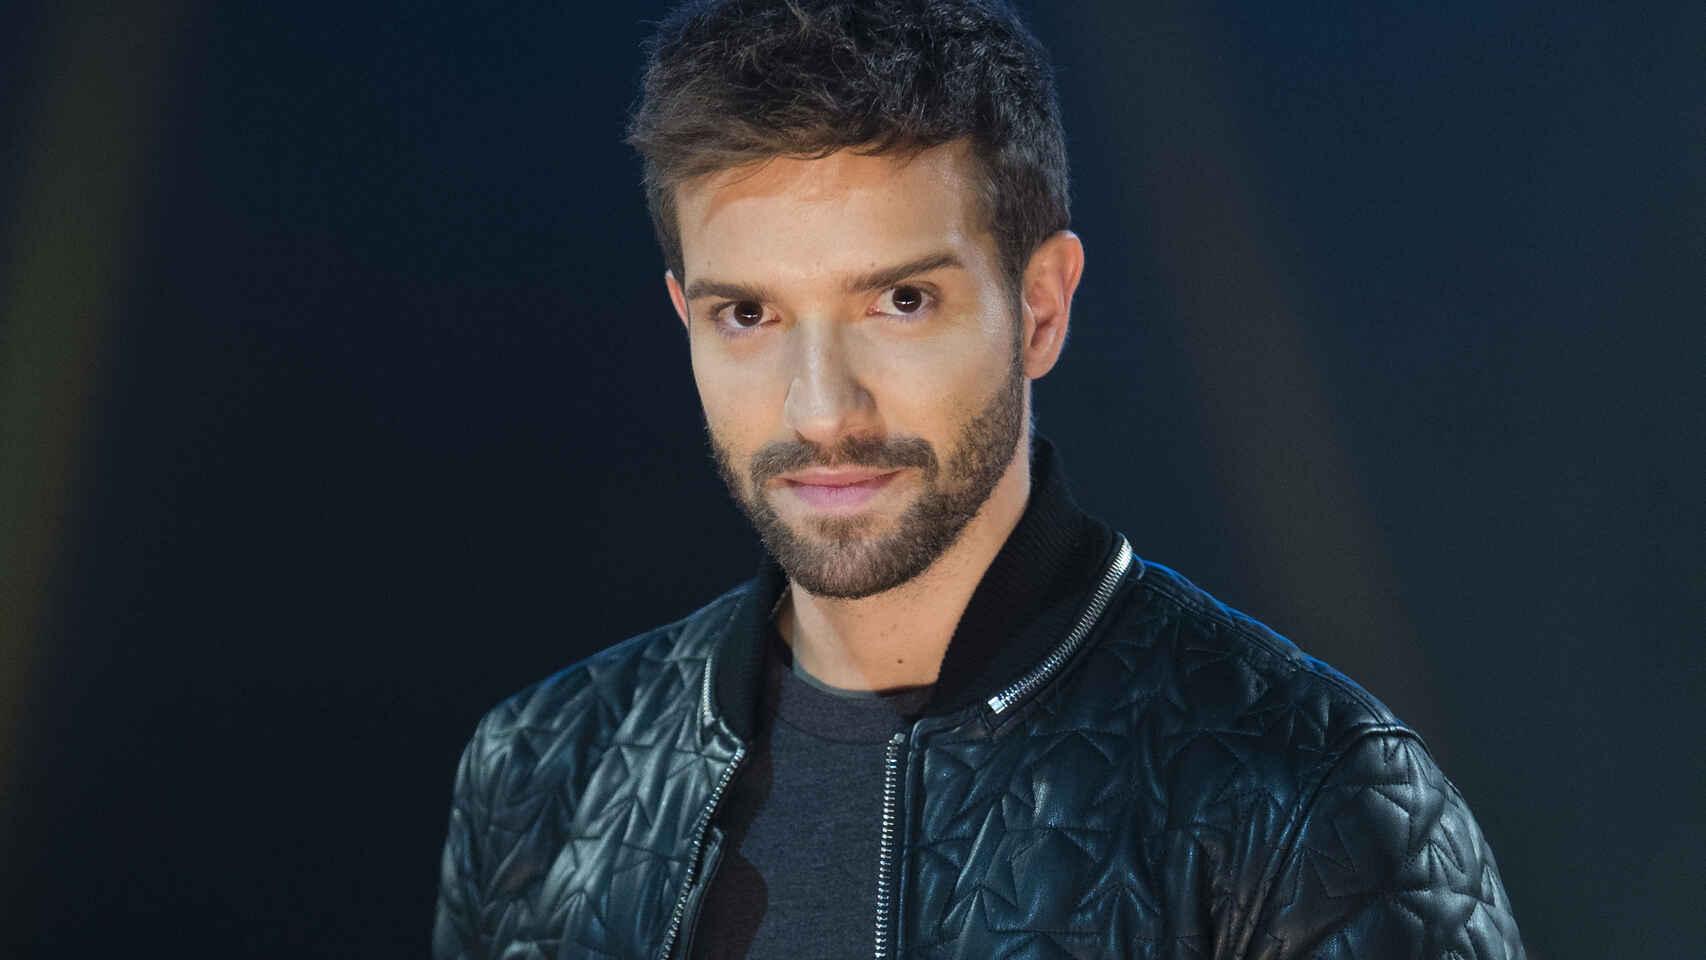 Pablo_Alboran-Musica-novio